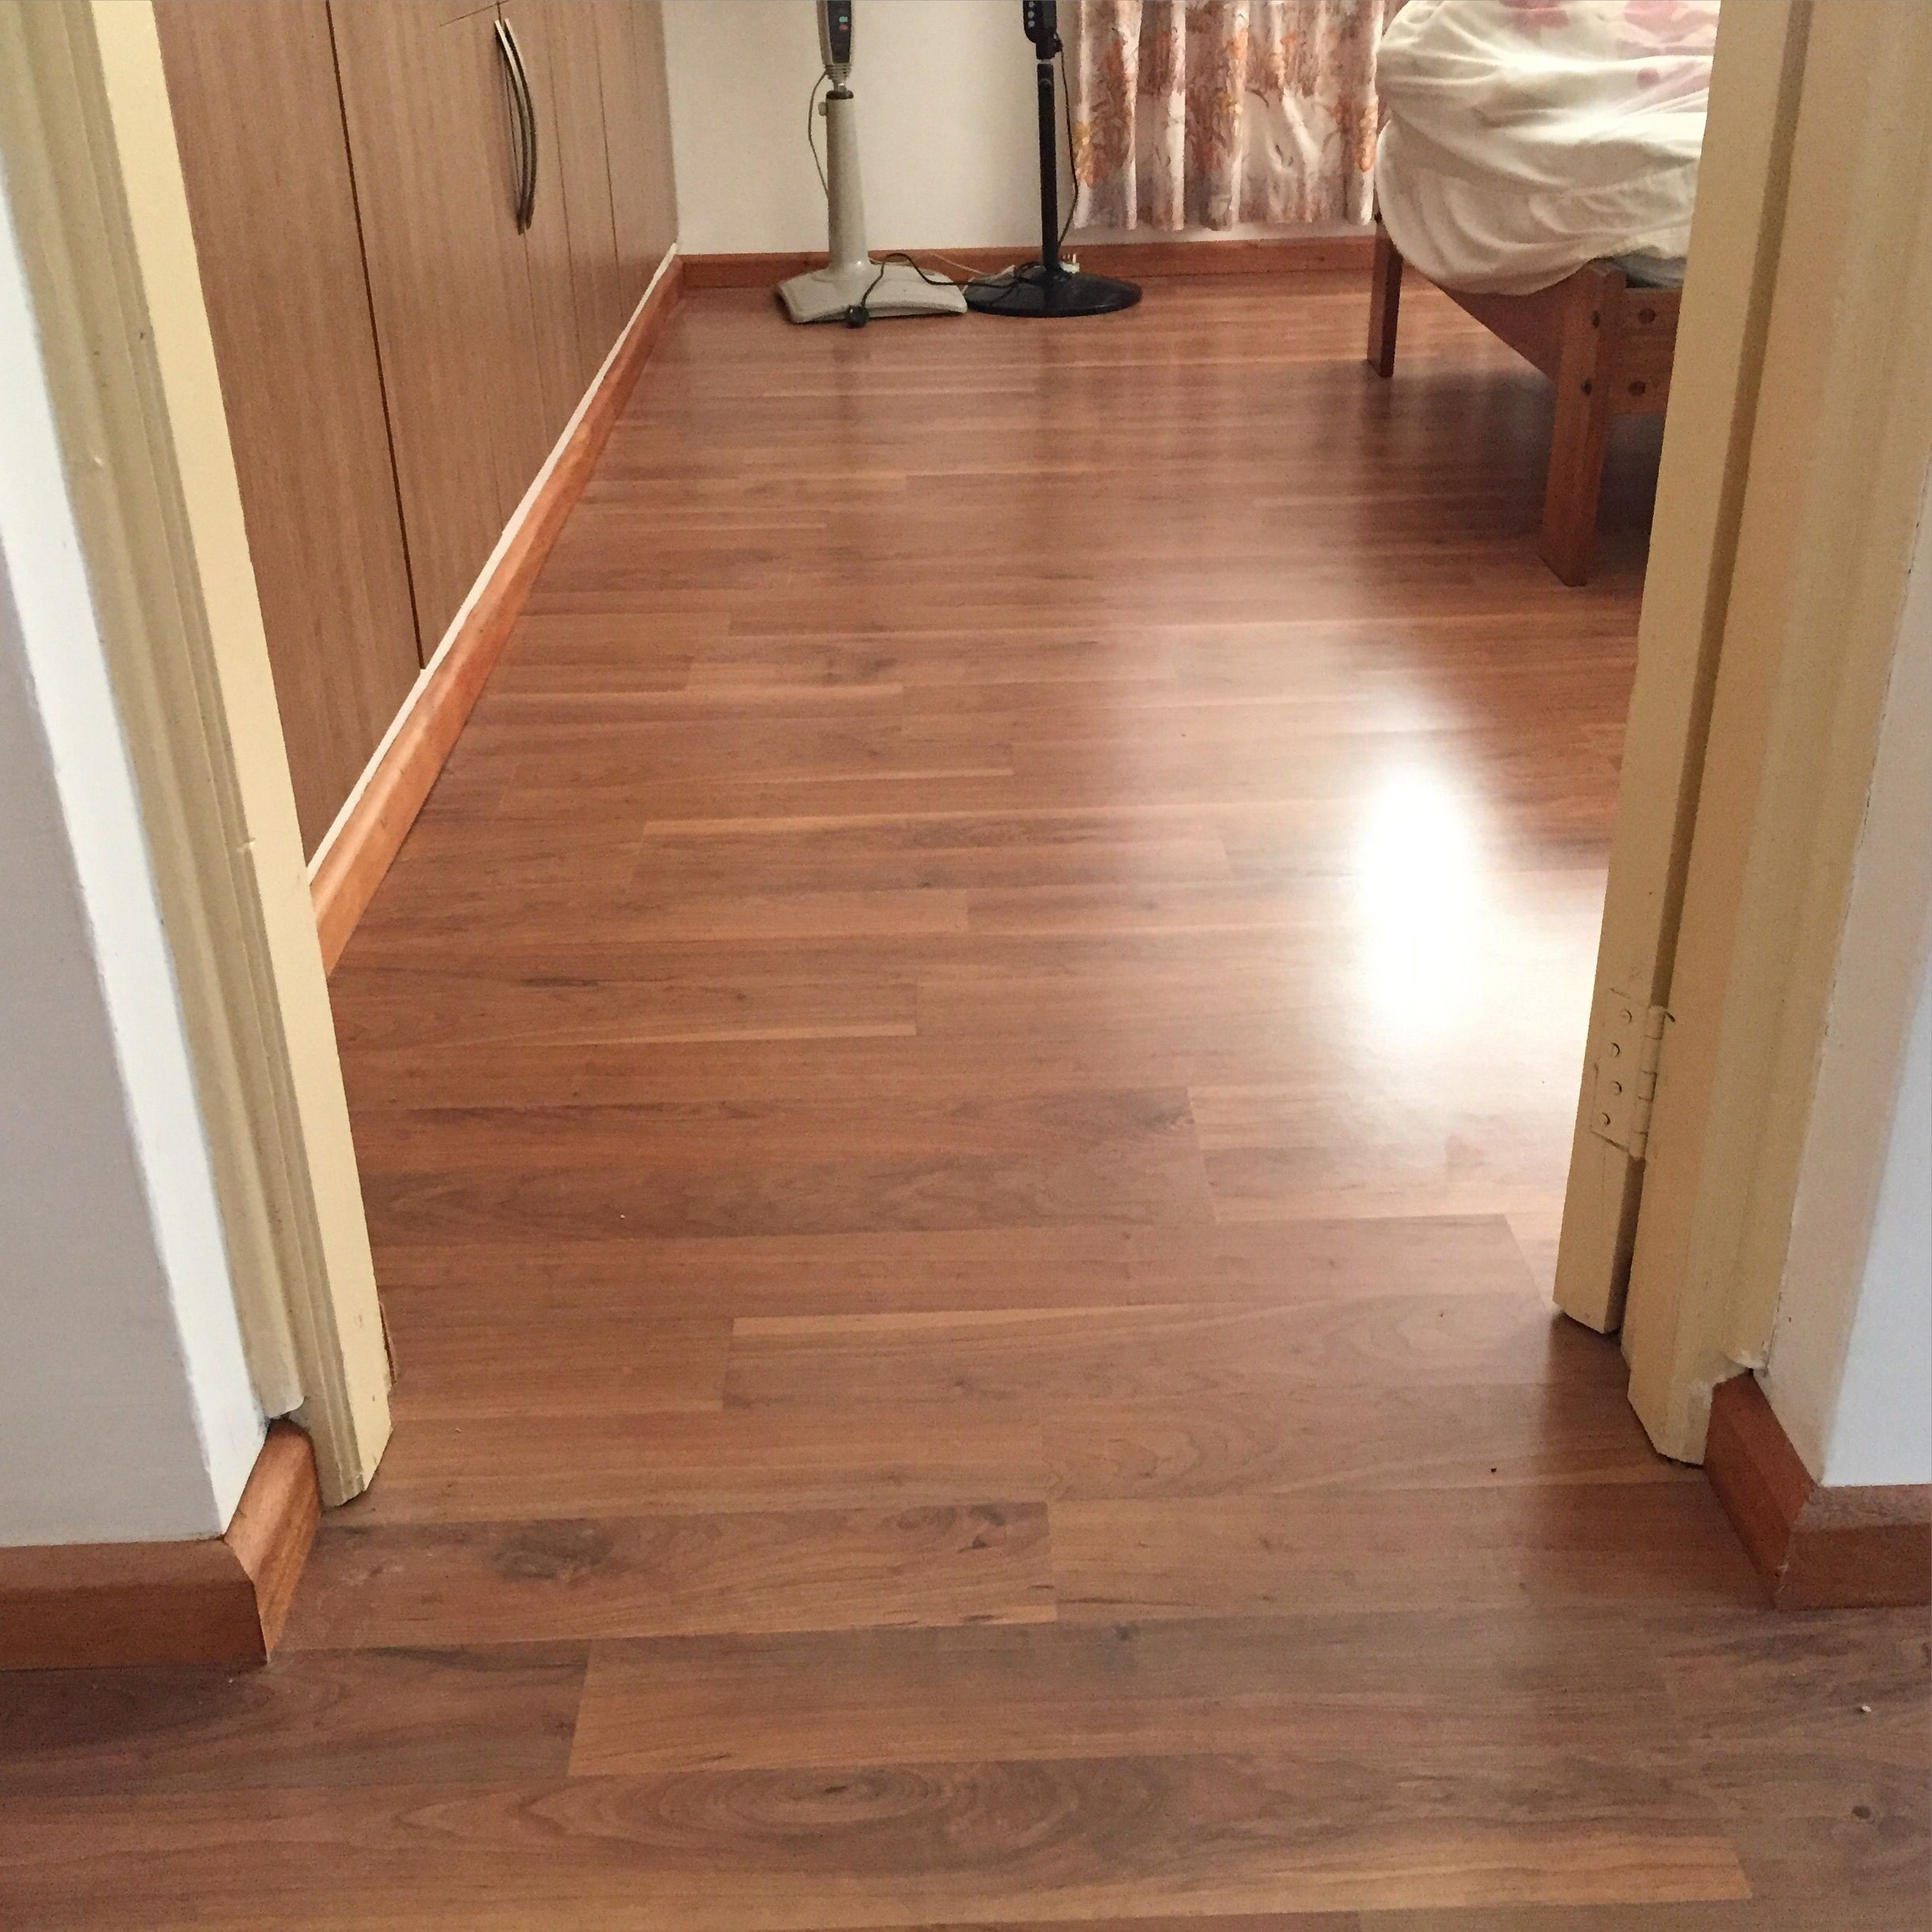 laying hardwood floors of new floor damage water fitspired me in floor decor in kenya concept of installing laminate flooring over tile of installing laminate flooring over